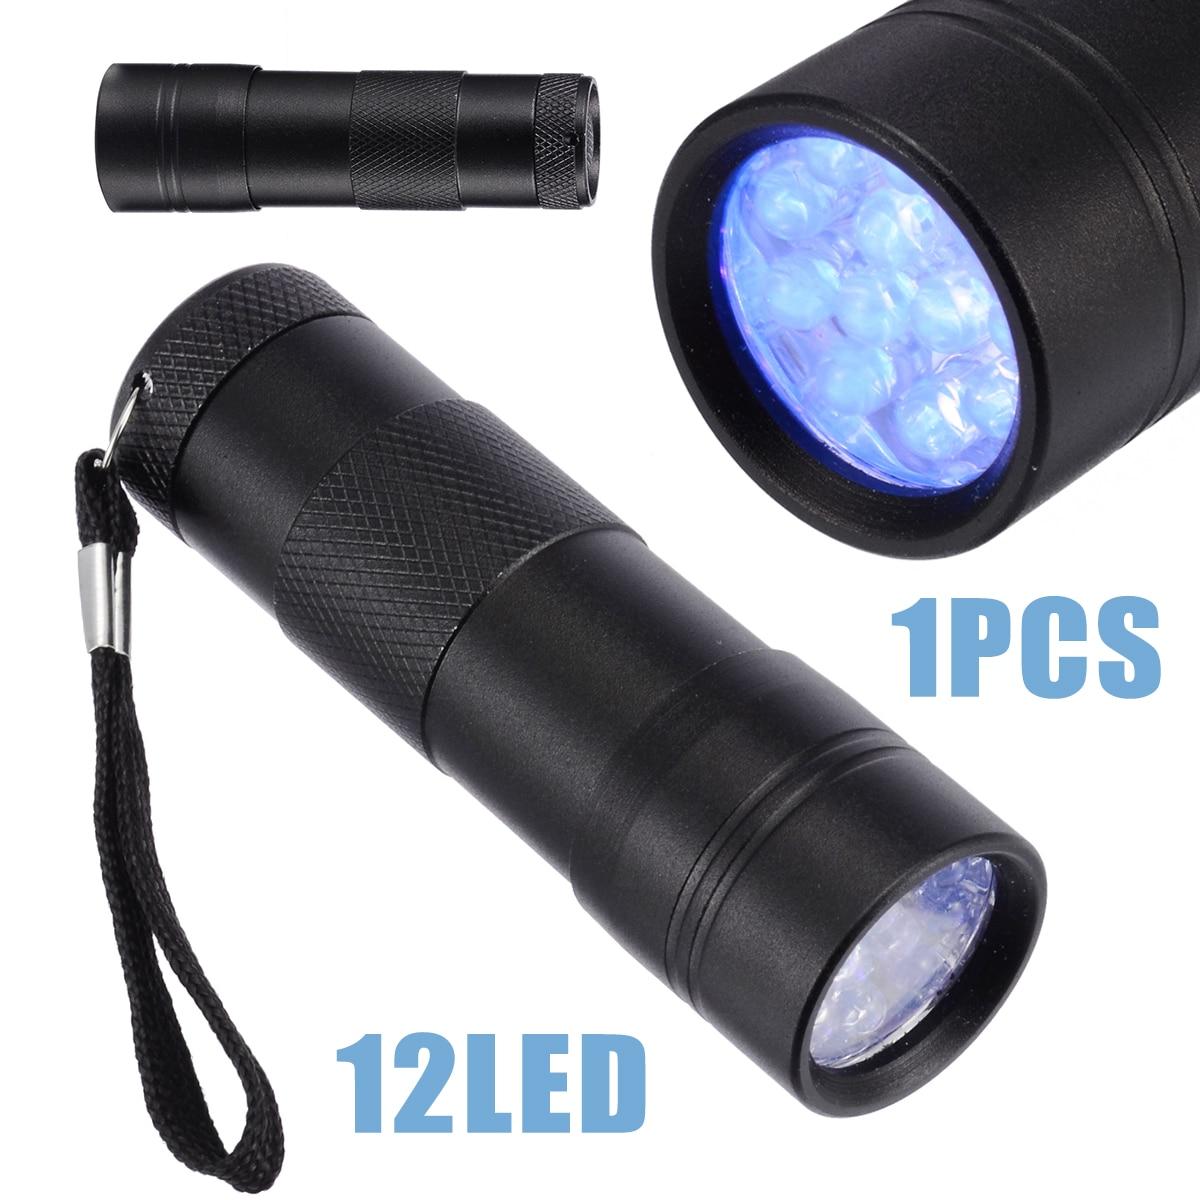 Uv gel cura luz preto profissional 12 led lanterna ultravioleta 395nm tocha para resina uv ofício bateria